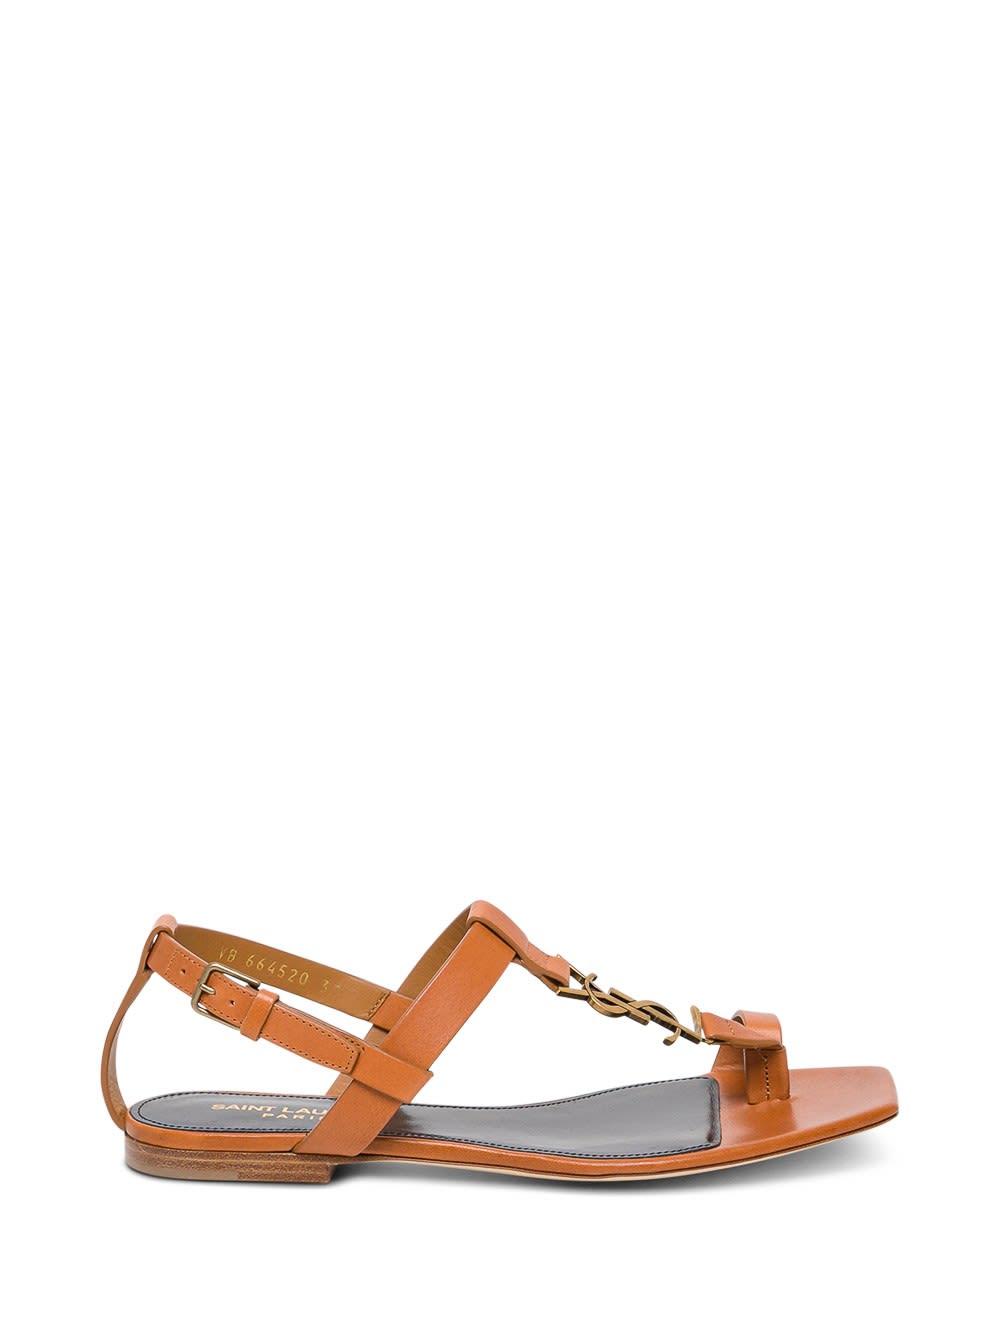 Saint Laurent Cassandra Sandals In Brown Leather With Golden Monogram